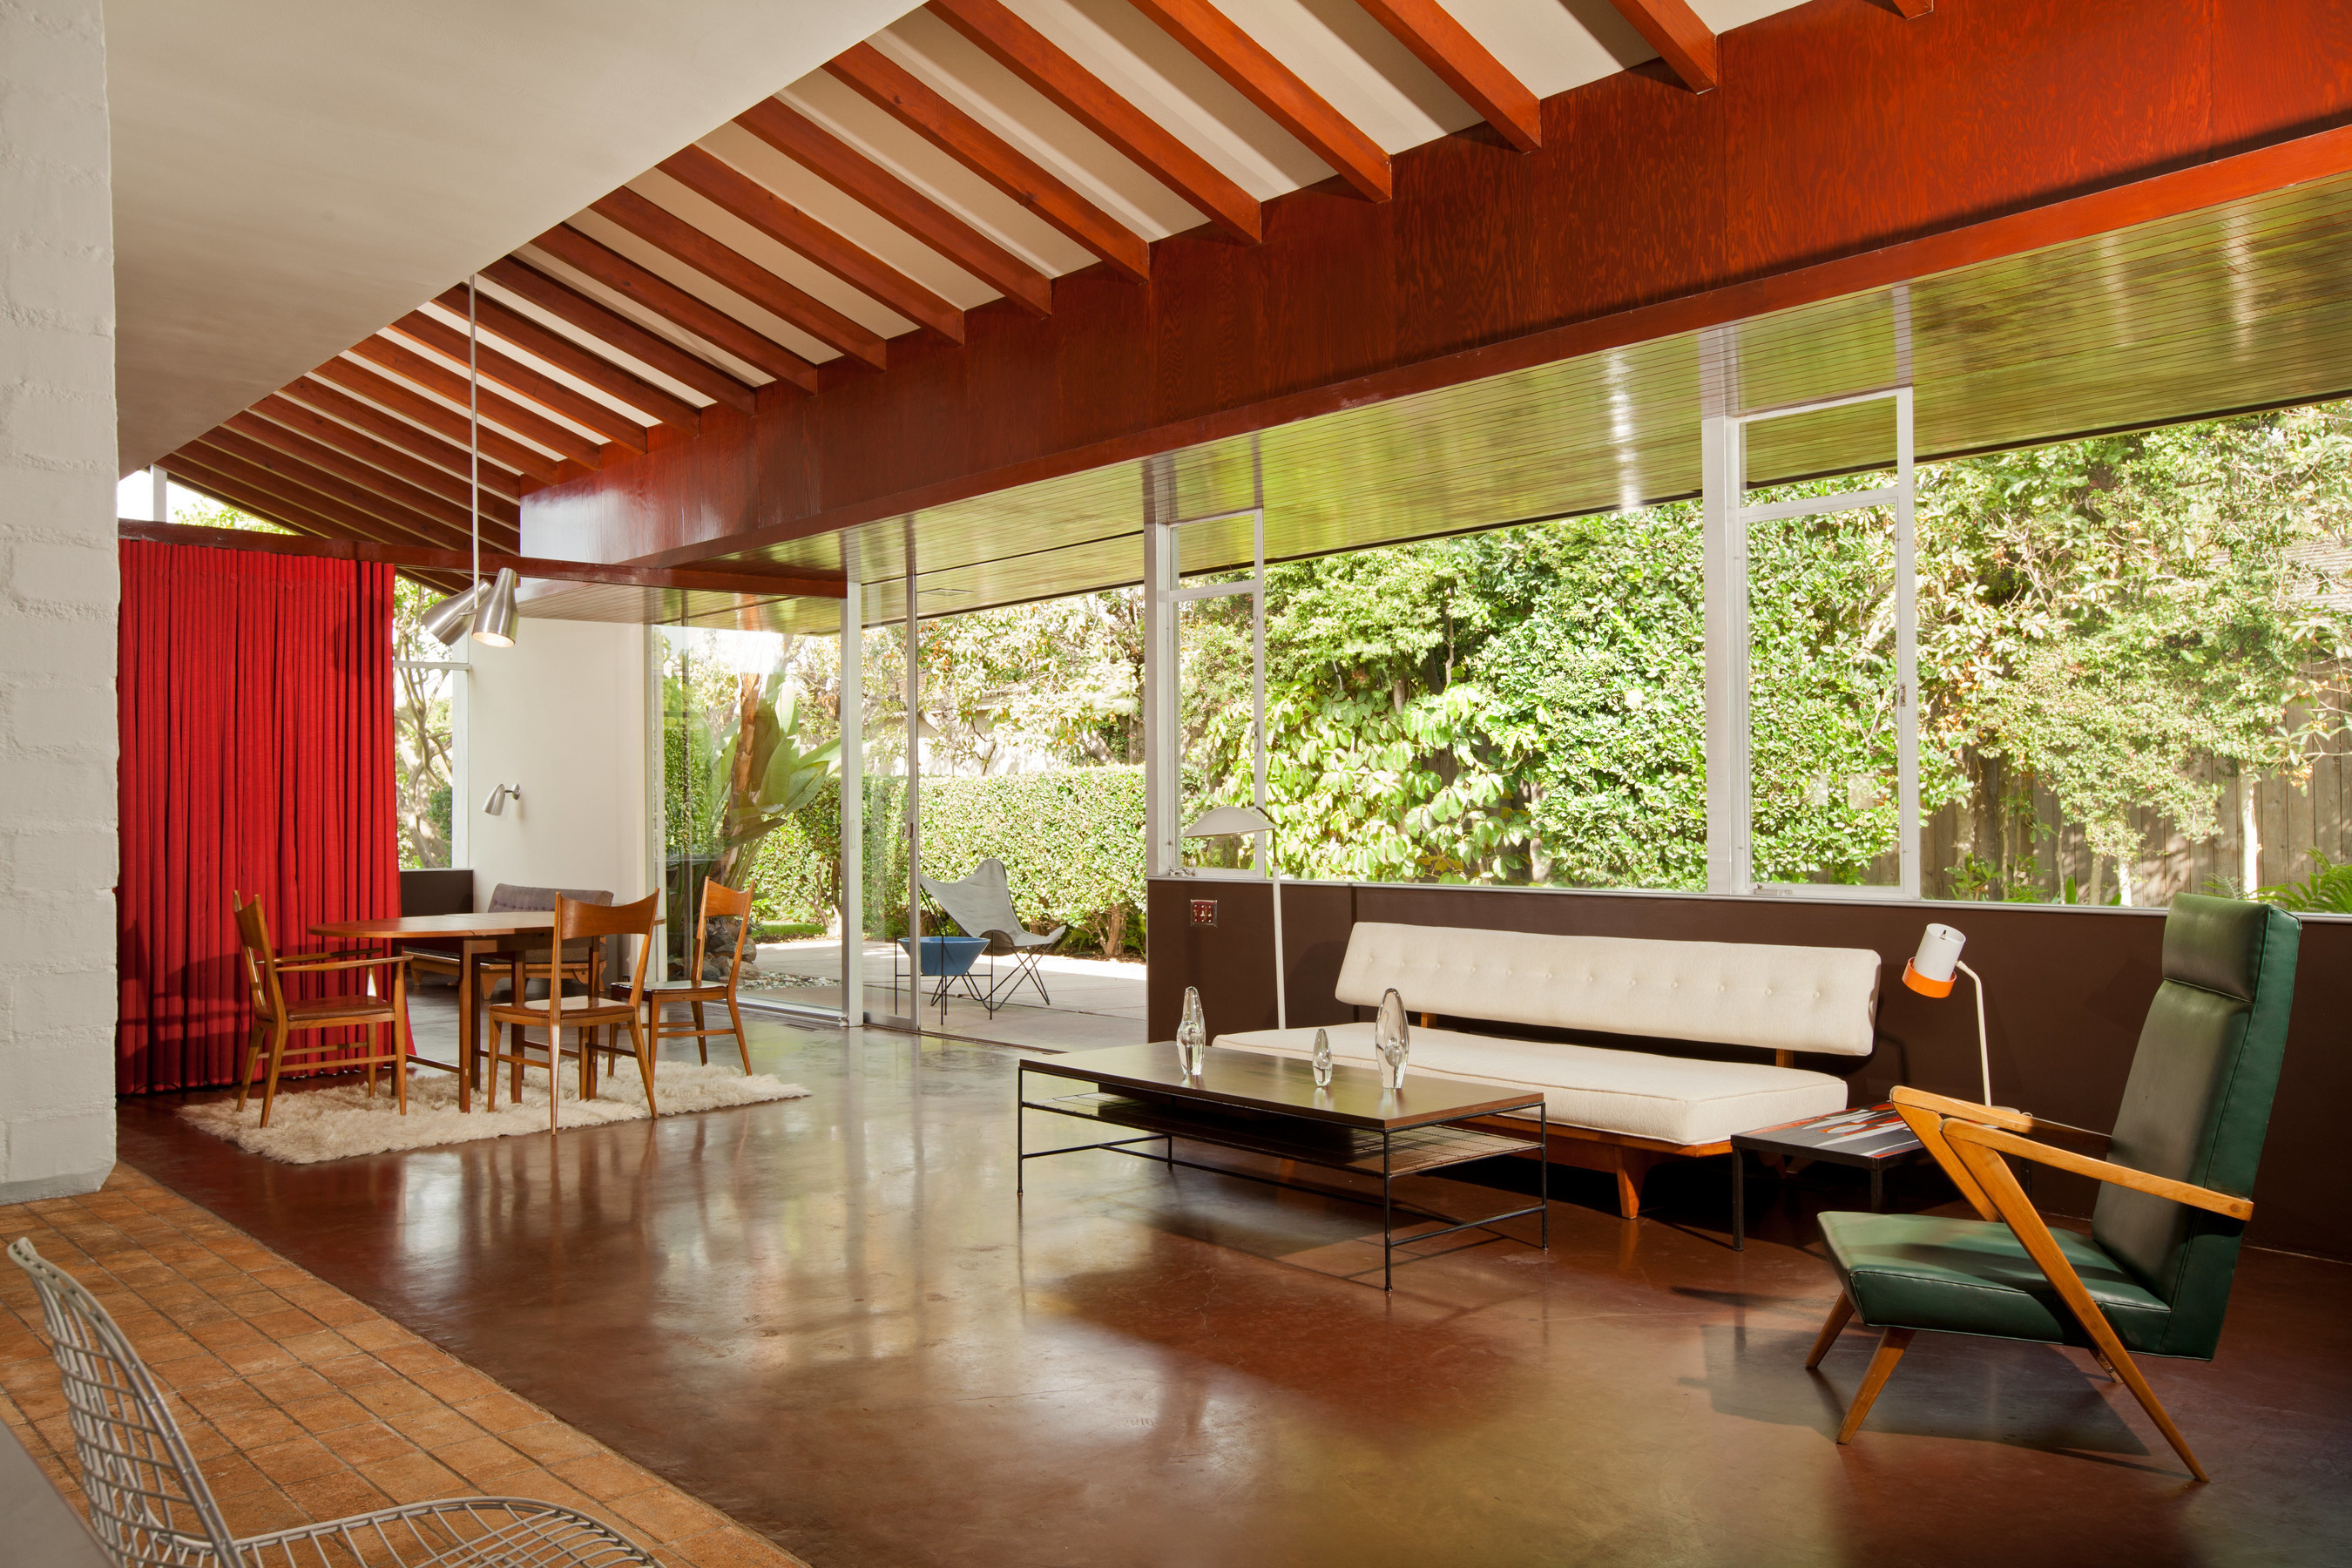 Kelly Sutherlin McLeod, FAIA's award-winning restoration of the Hafley House in Long Beach, CA